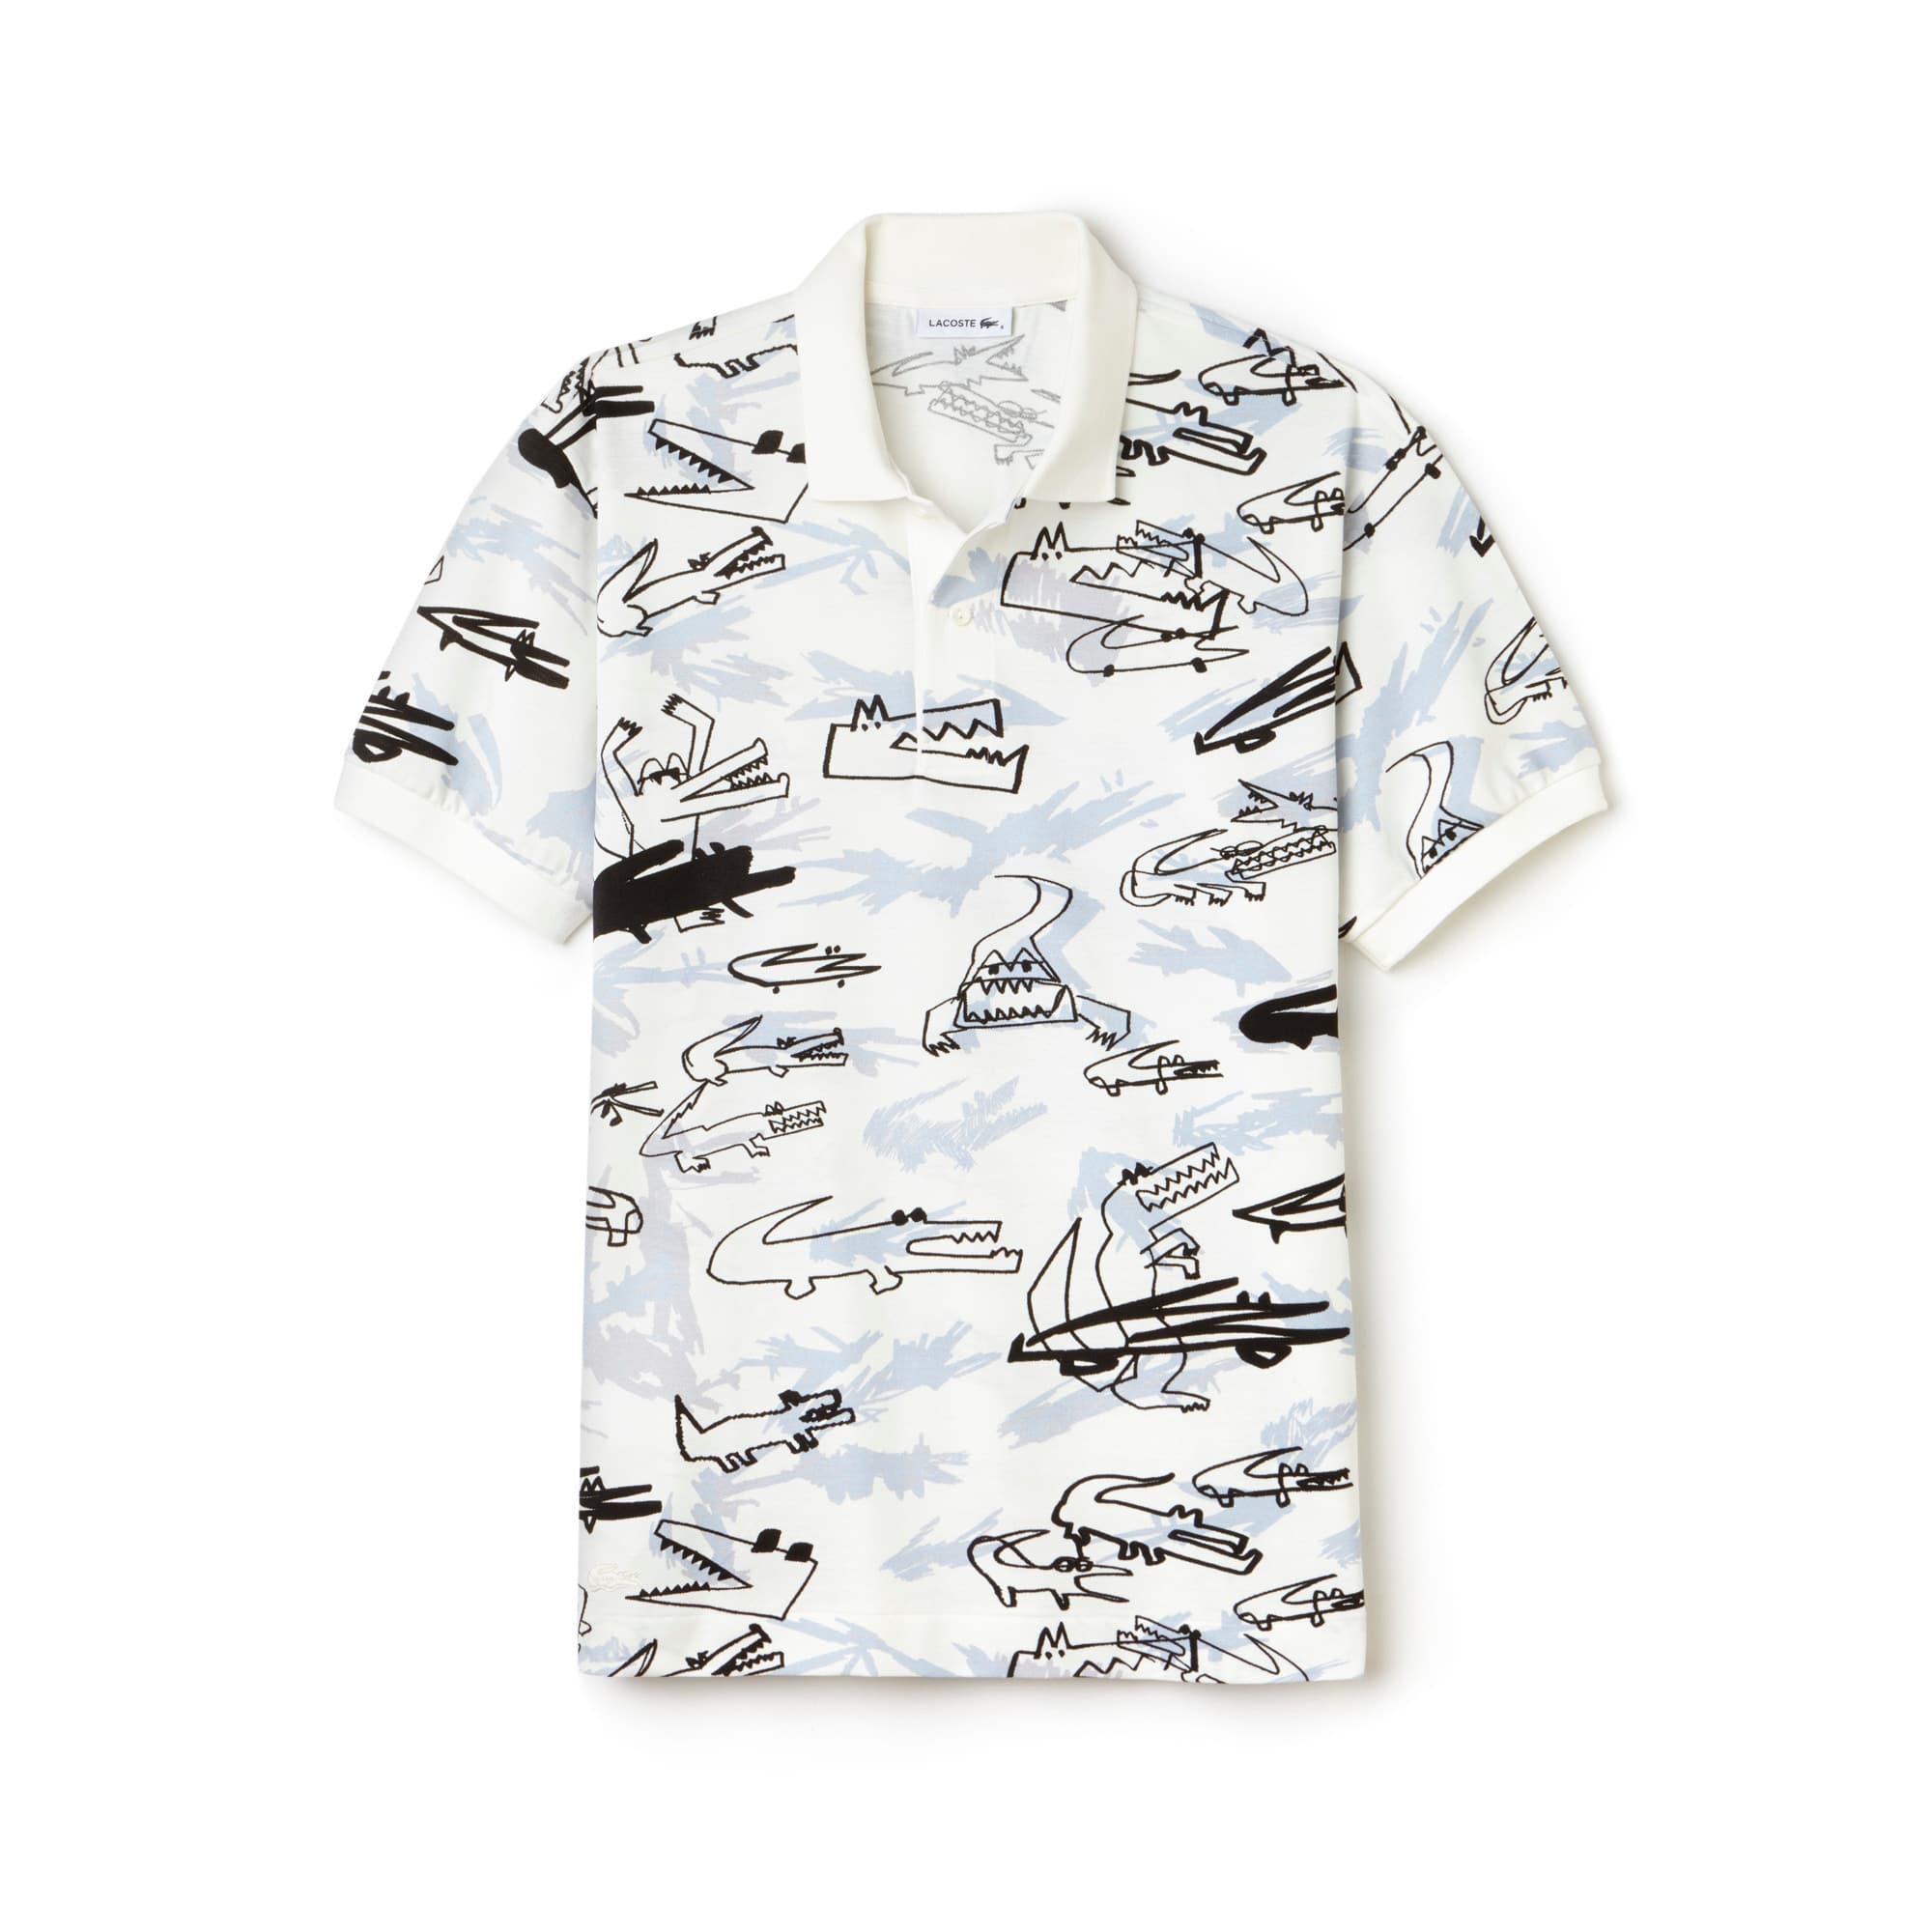 Men's Fashion Show Oversized Croc Print Polo Shirt